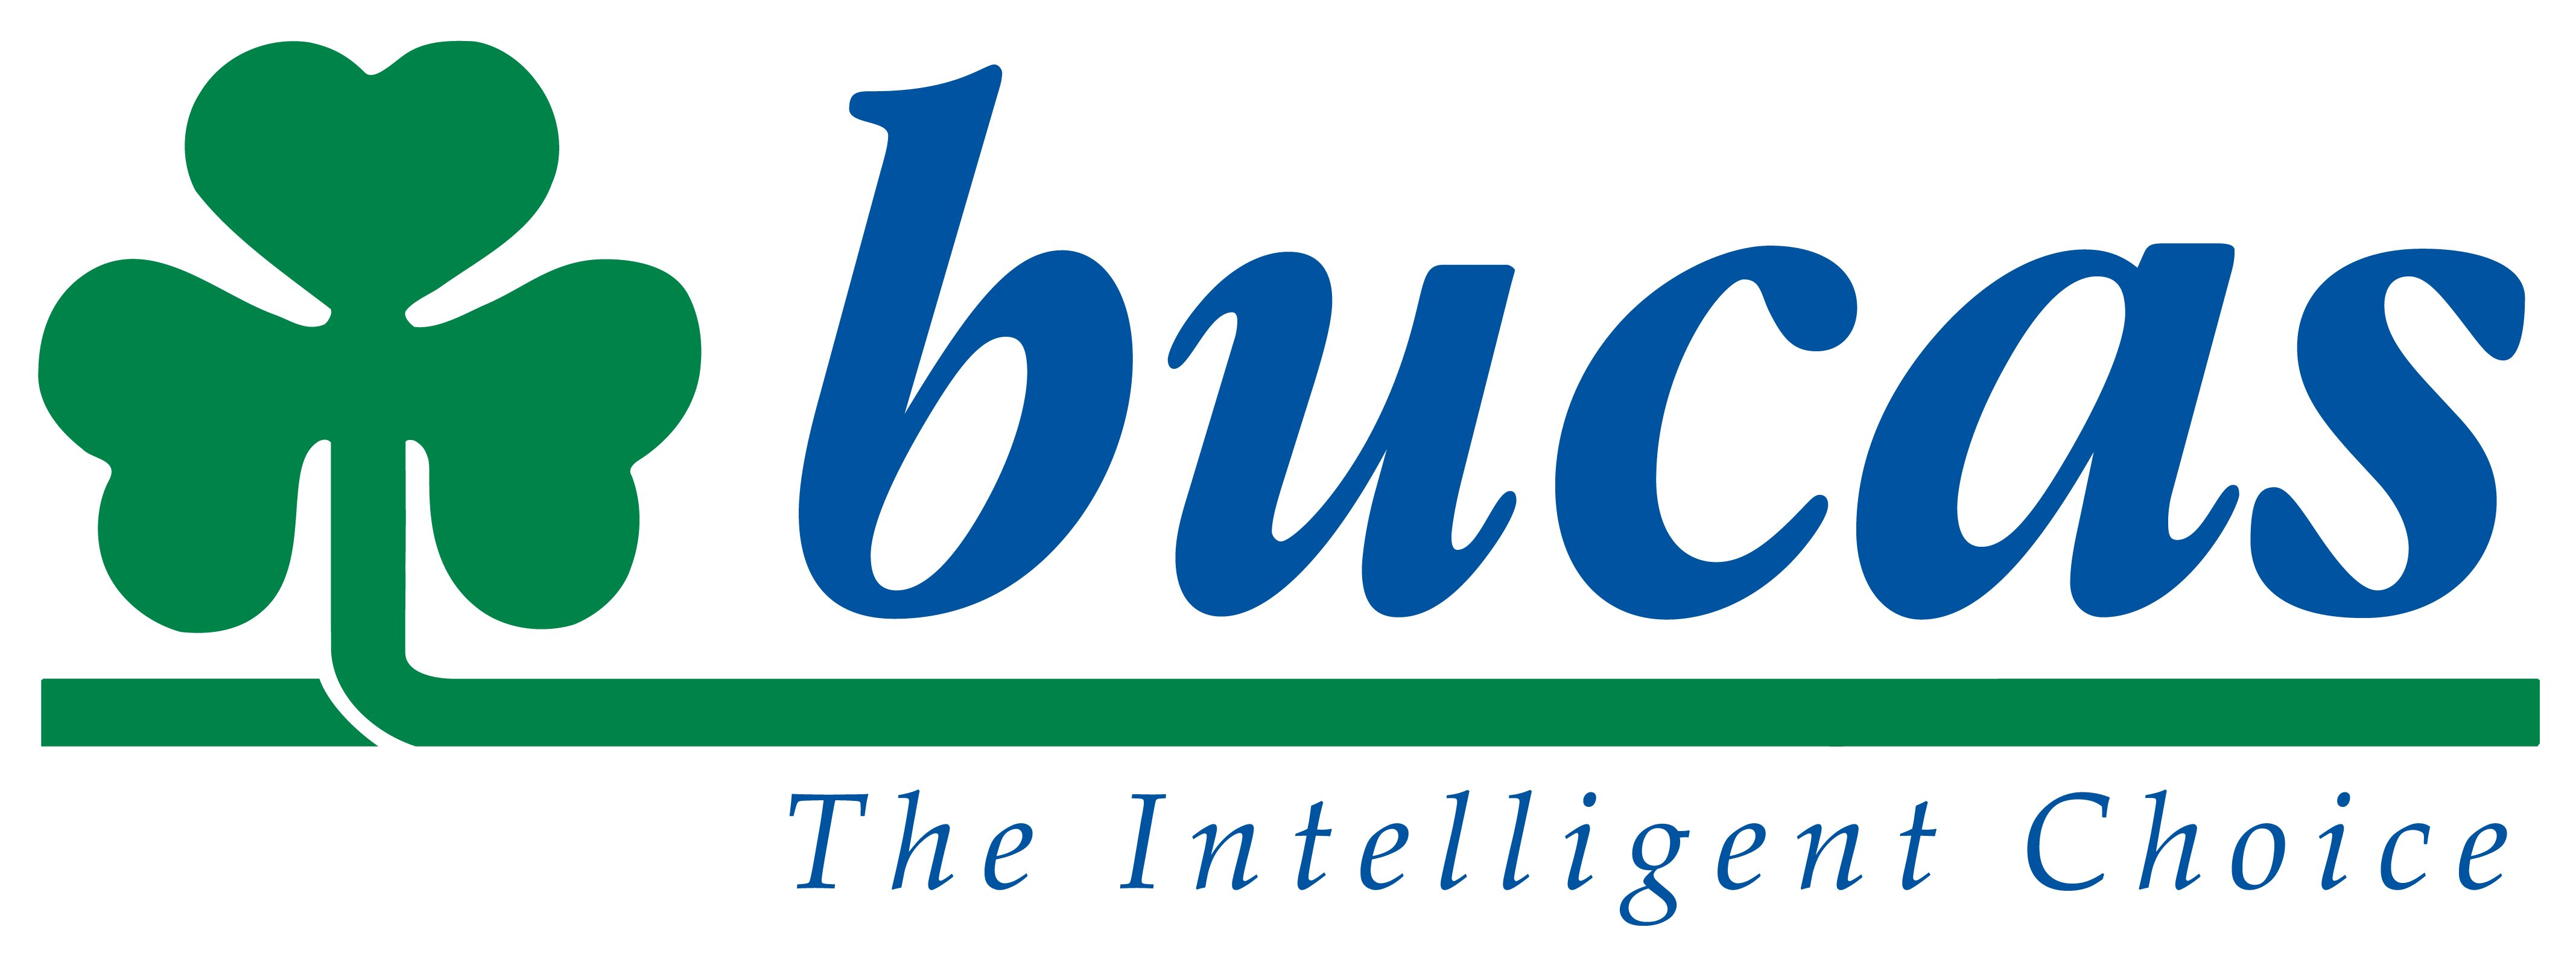 BUCAS logo_color_ai